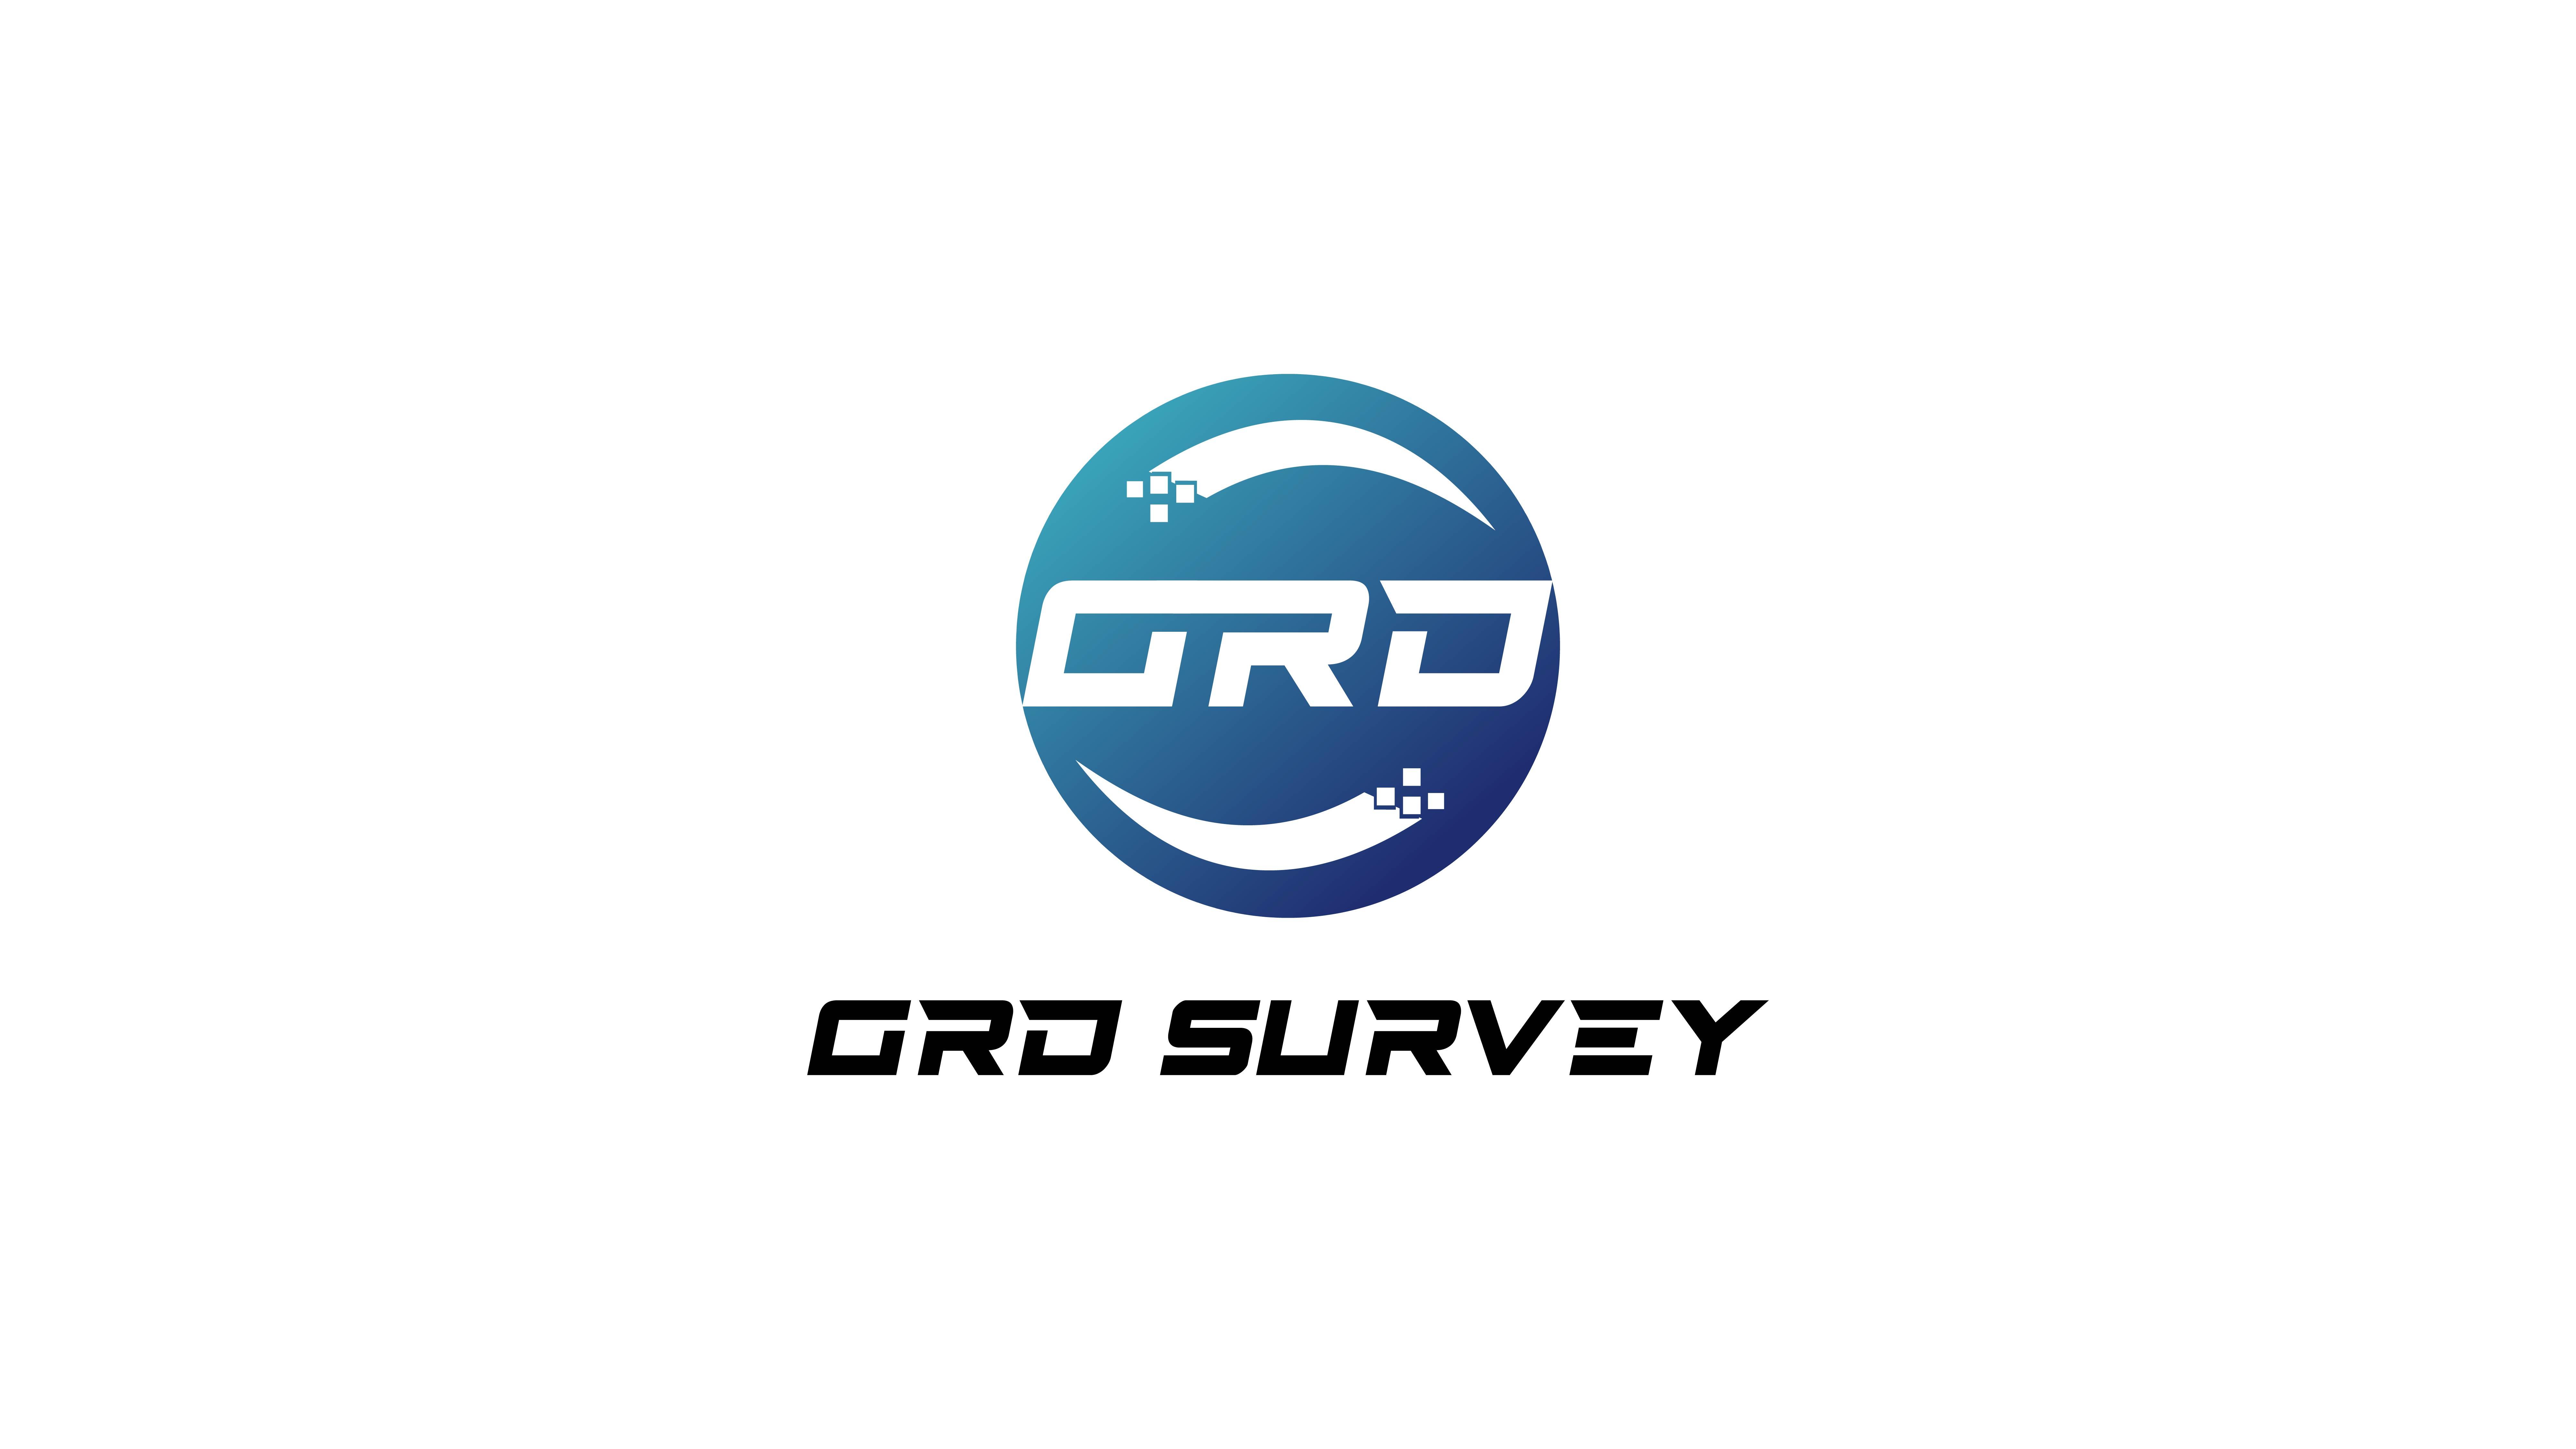 GRD Survey